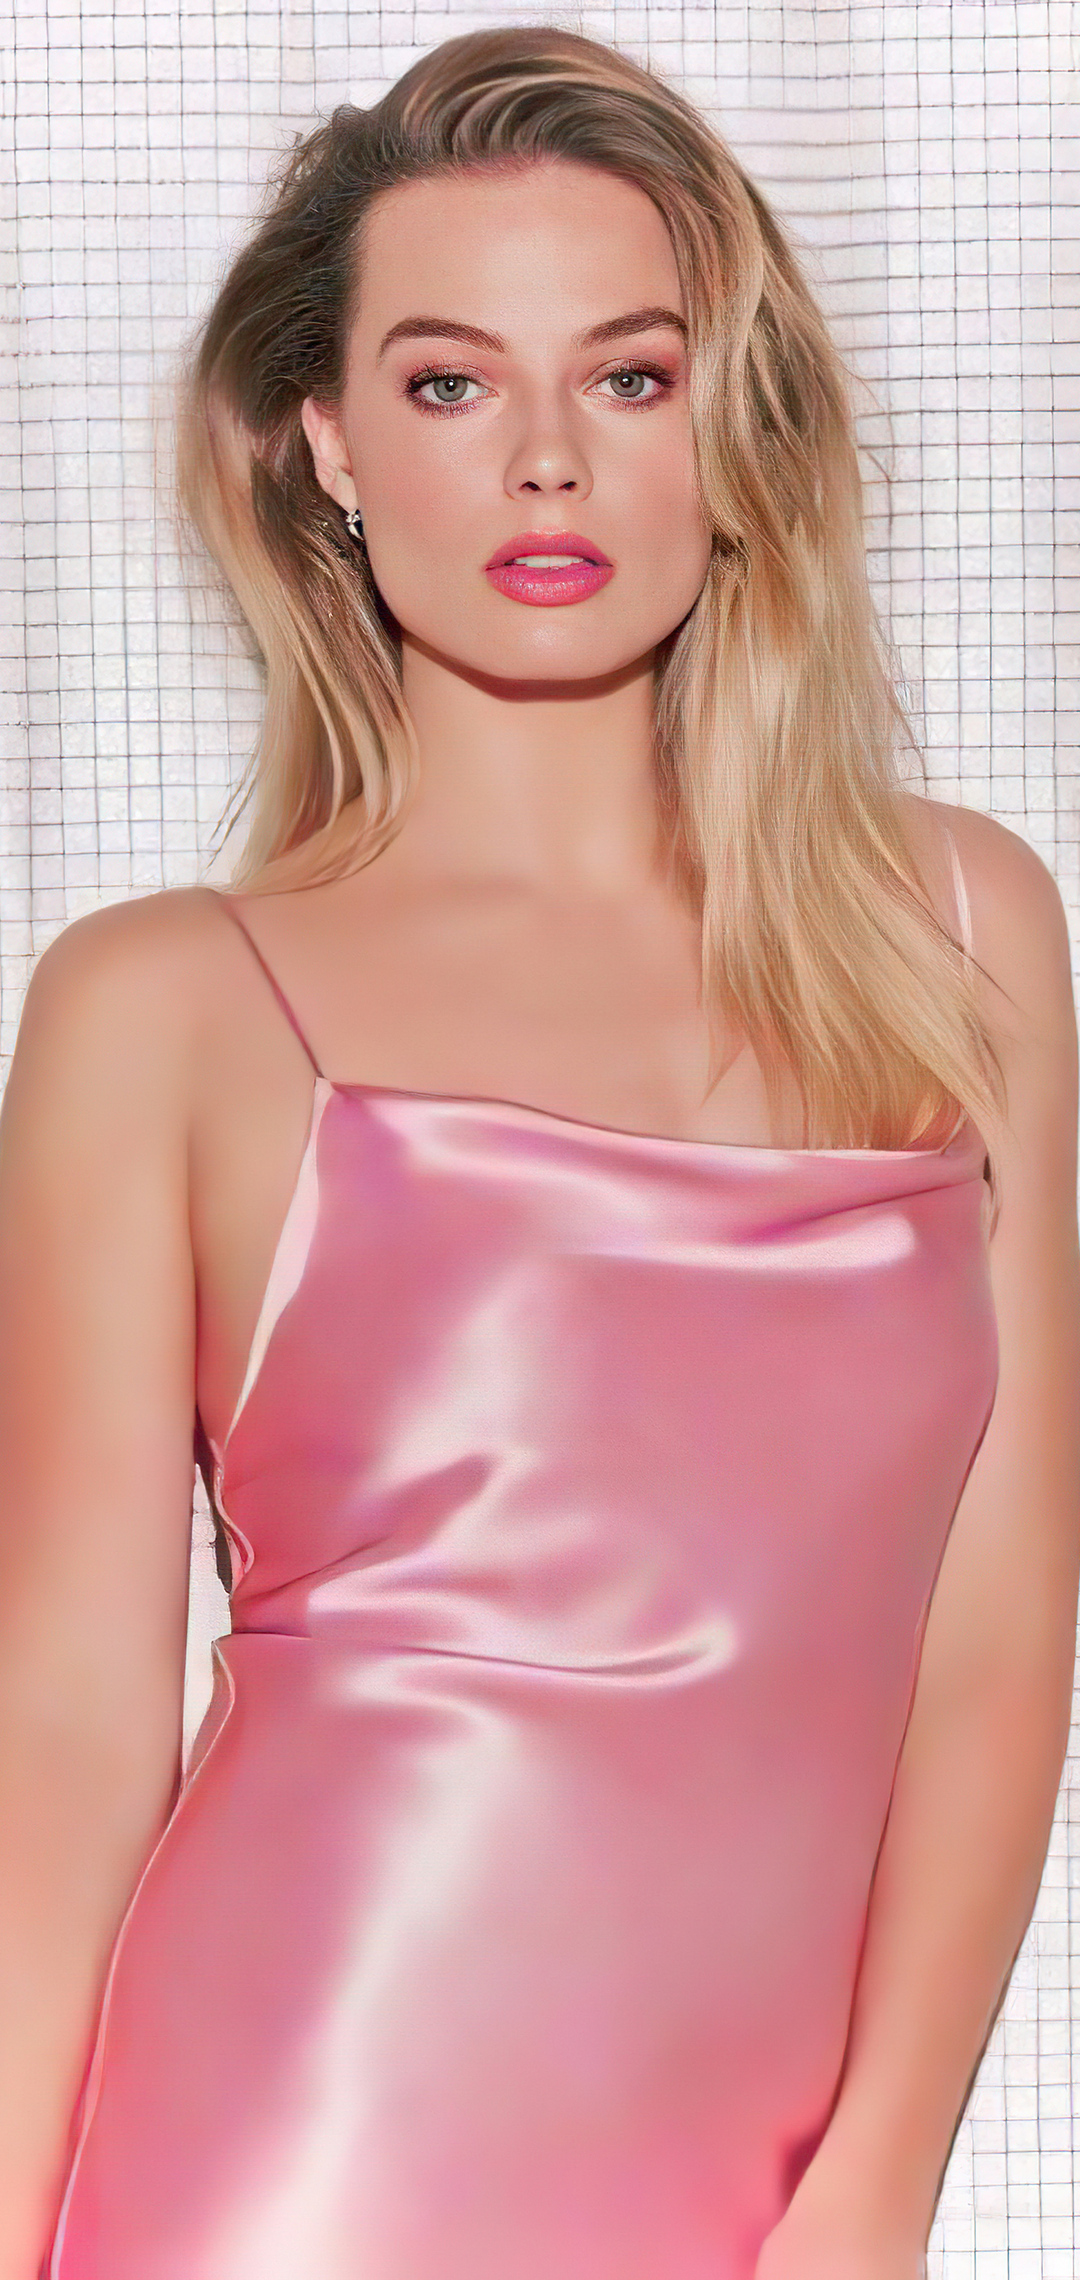 margot-robbie-in-pink-dress-4k-ny.jpg